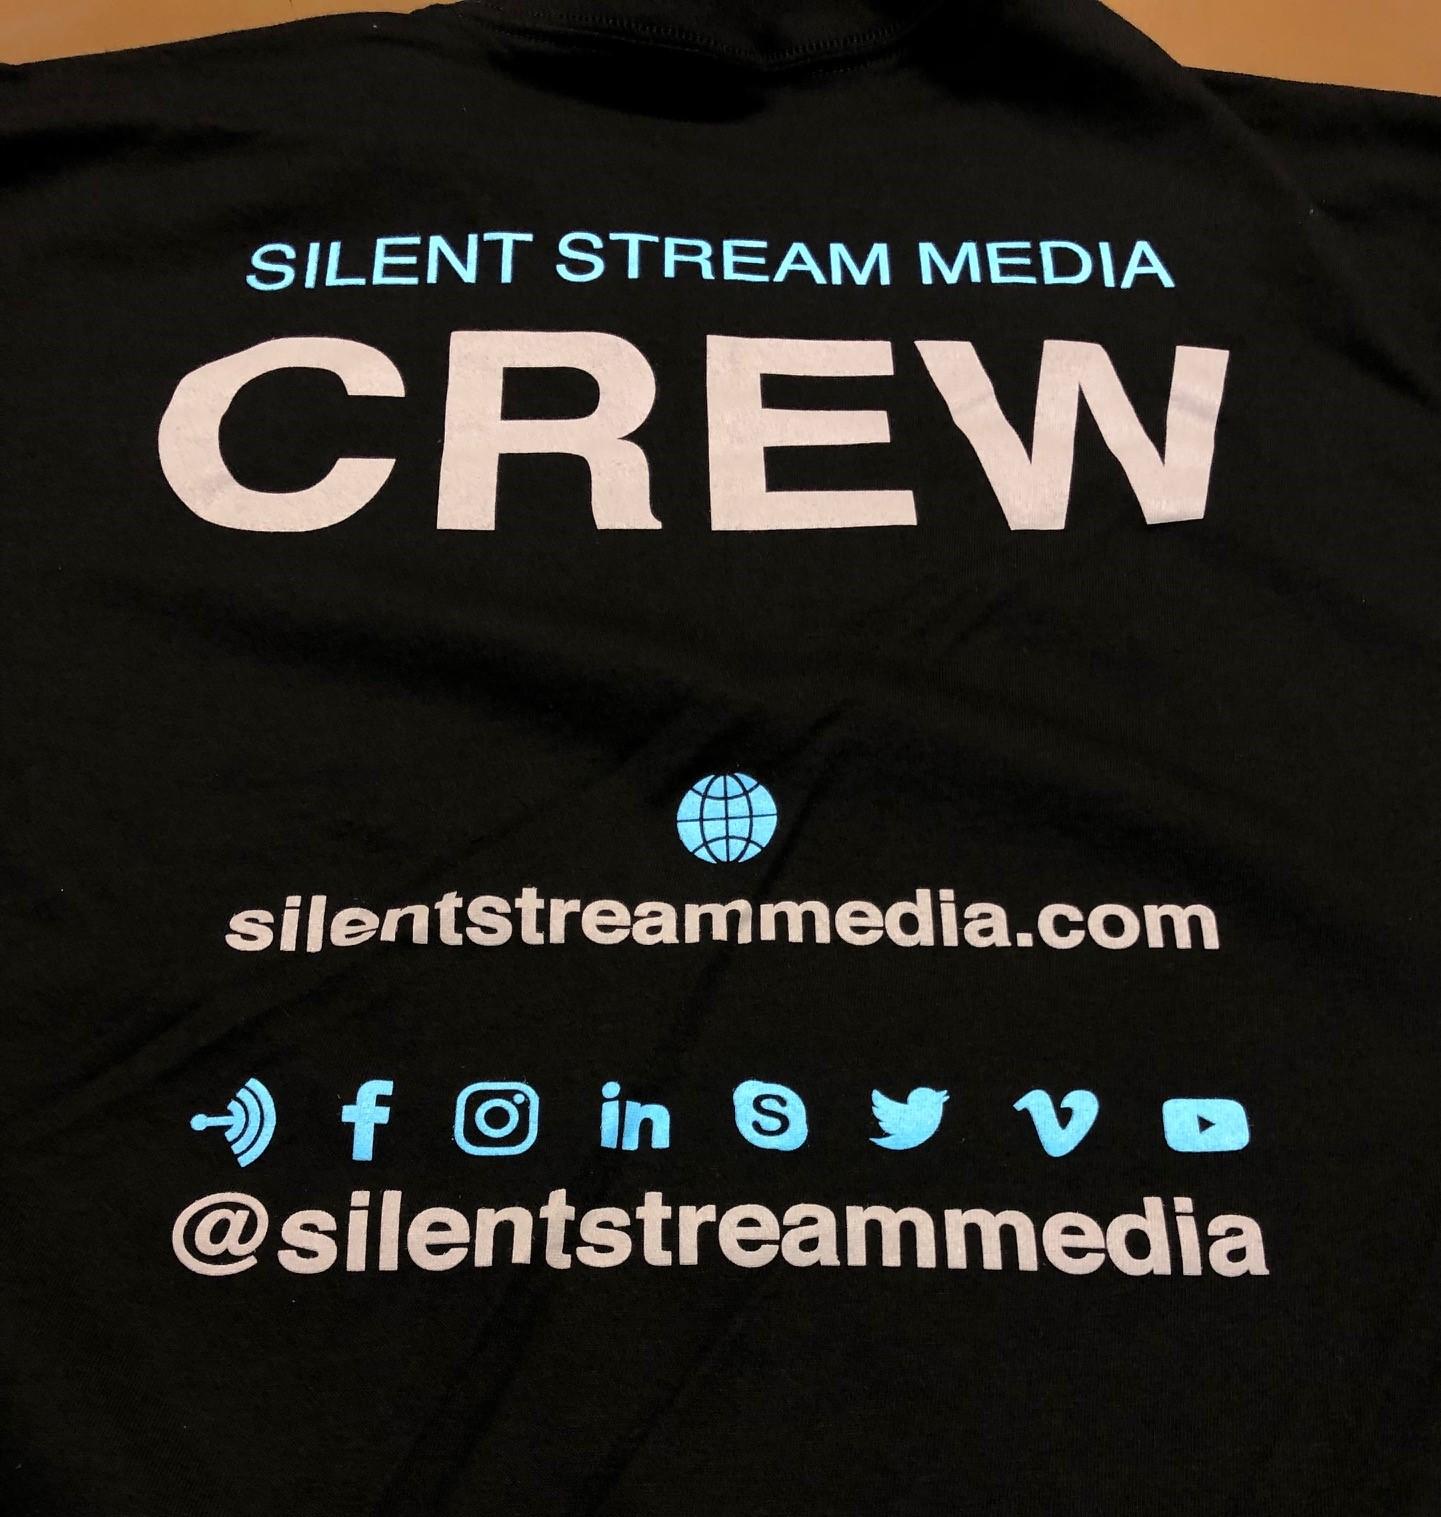 logounltd_laser_etching_embroidery_screen_printing_apparel_uniform_custom_tshirts_t_shirt_kirkland_bellevue_seattle_redmond_woodinville_branded_merchandise_promotional_products_logo_unltd_silent_stream_meadia (4).jpg